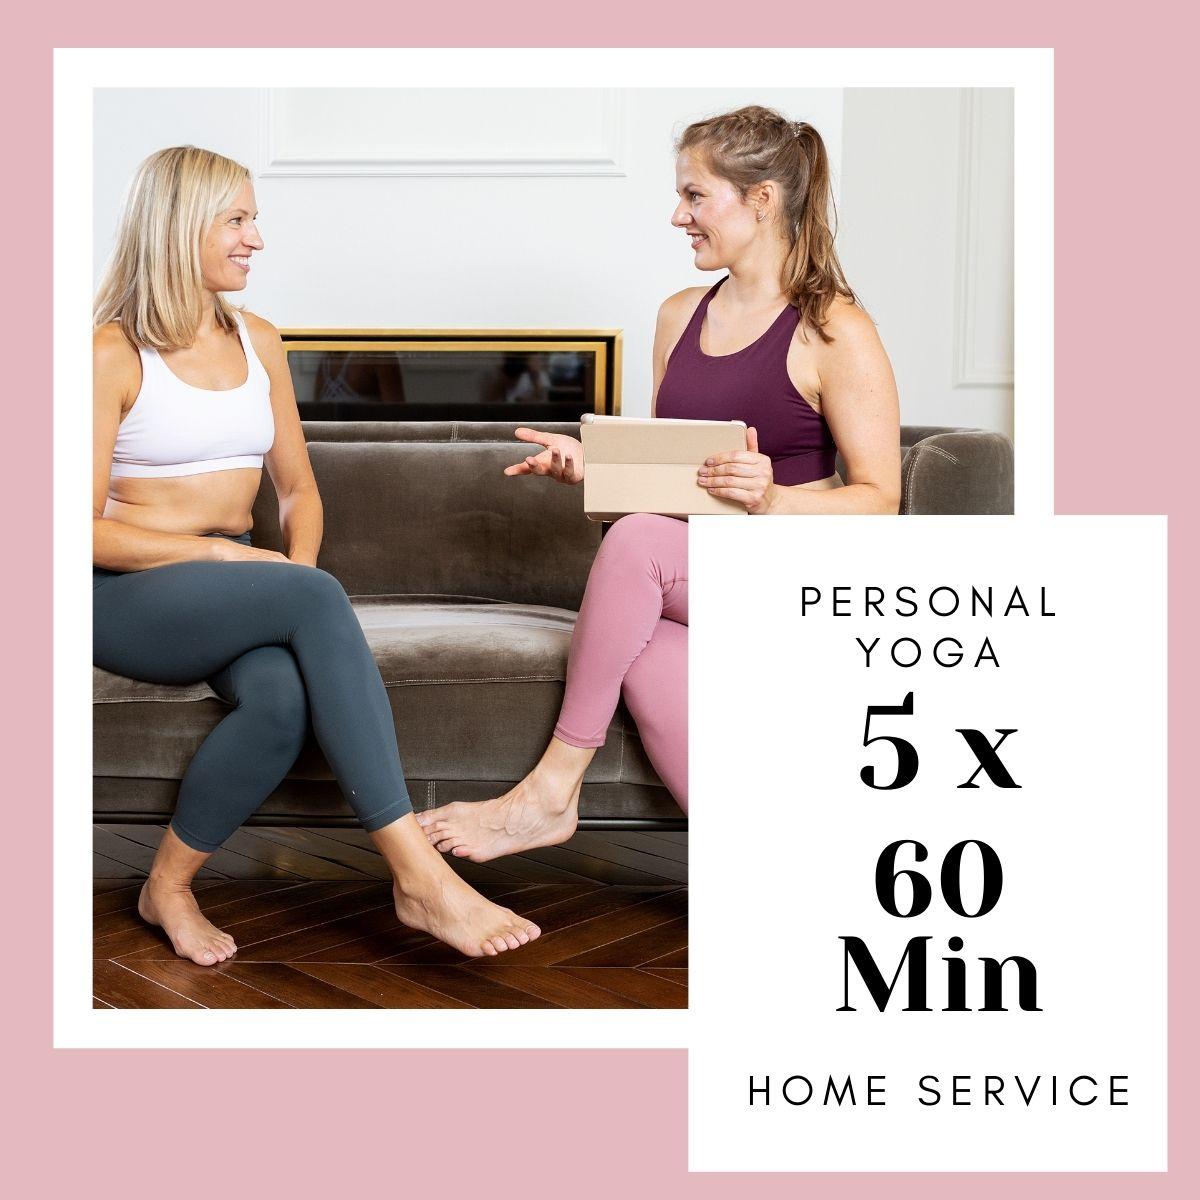 personal-training-yoga-privatunterricht-freiburg-fuenferkarte